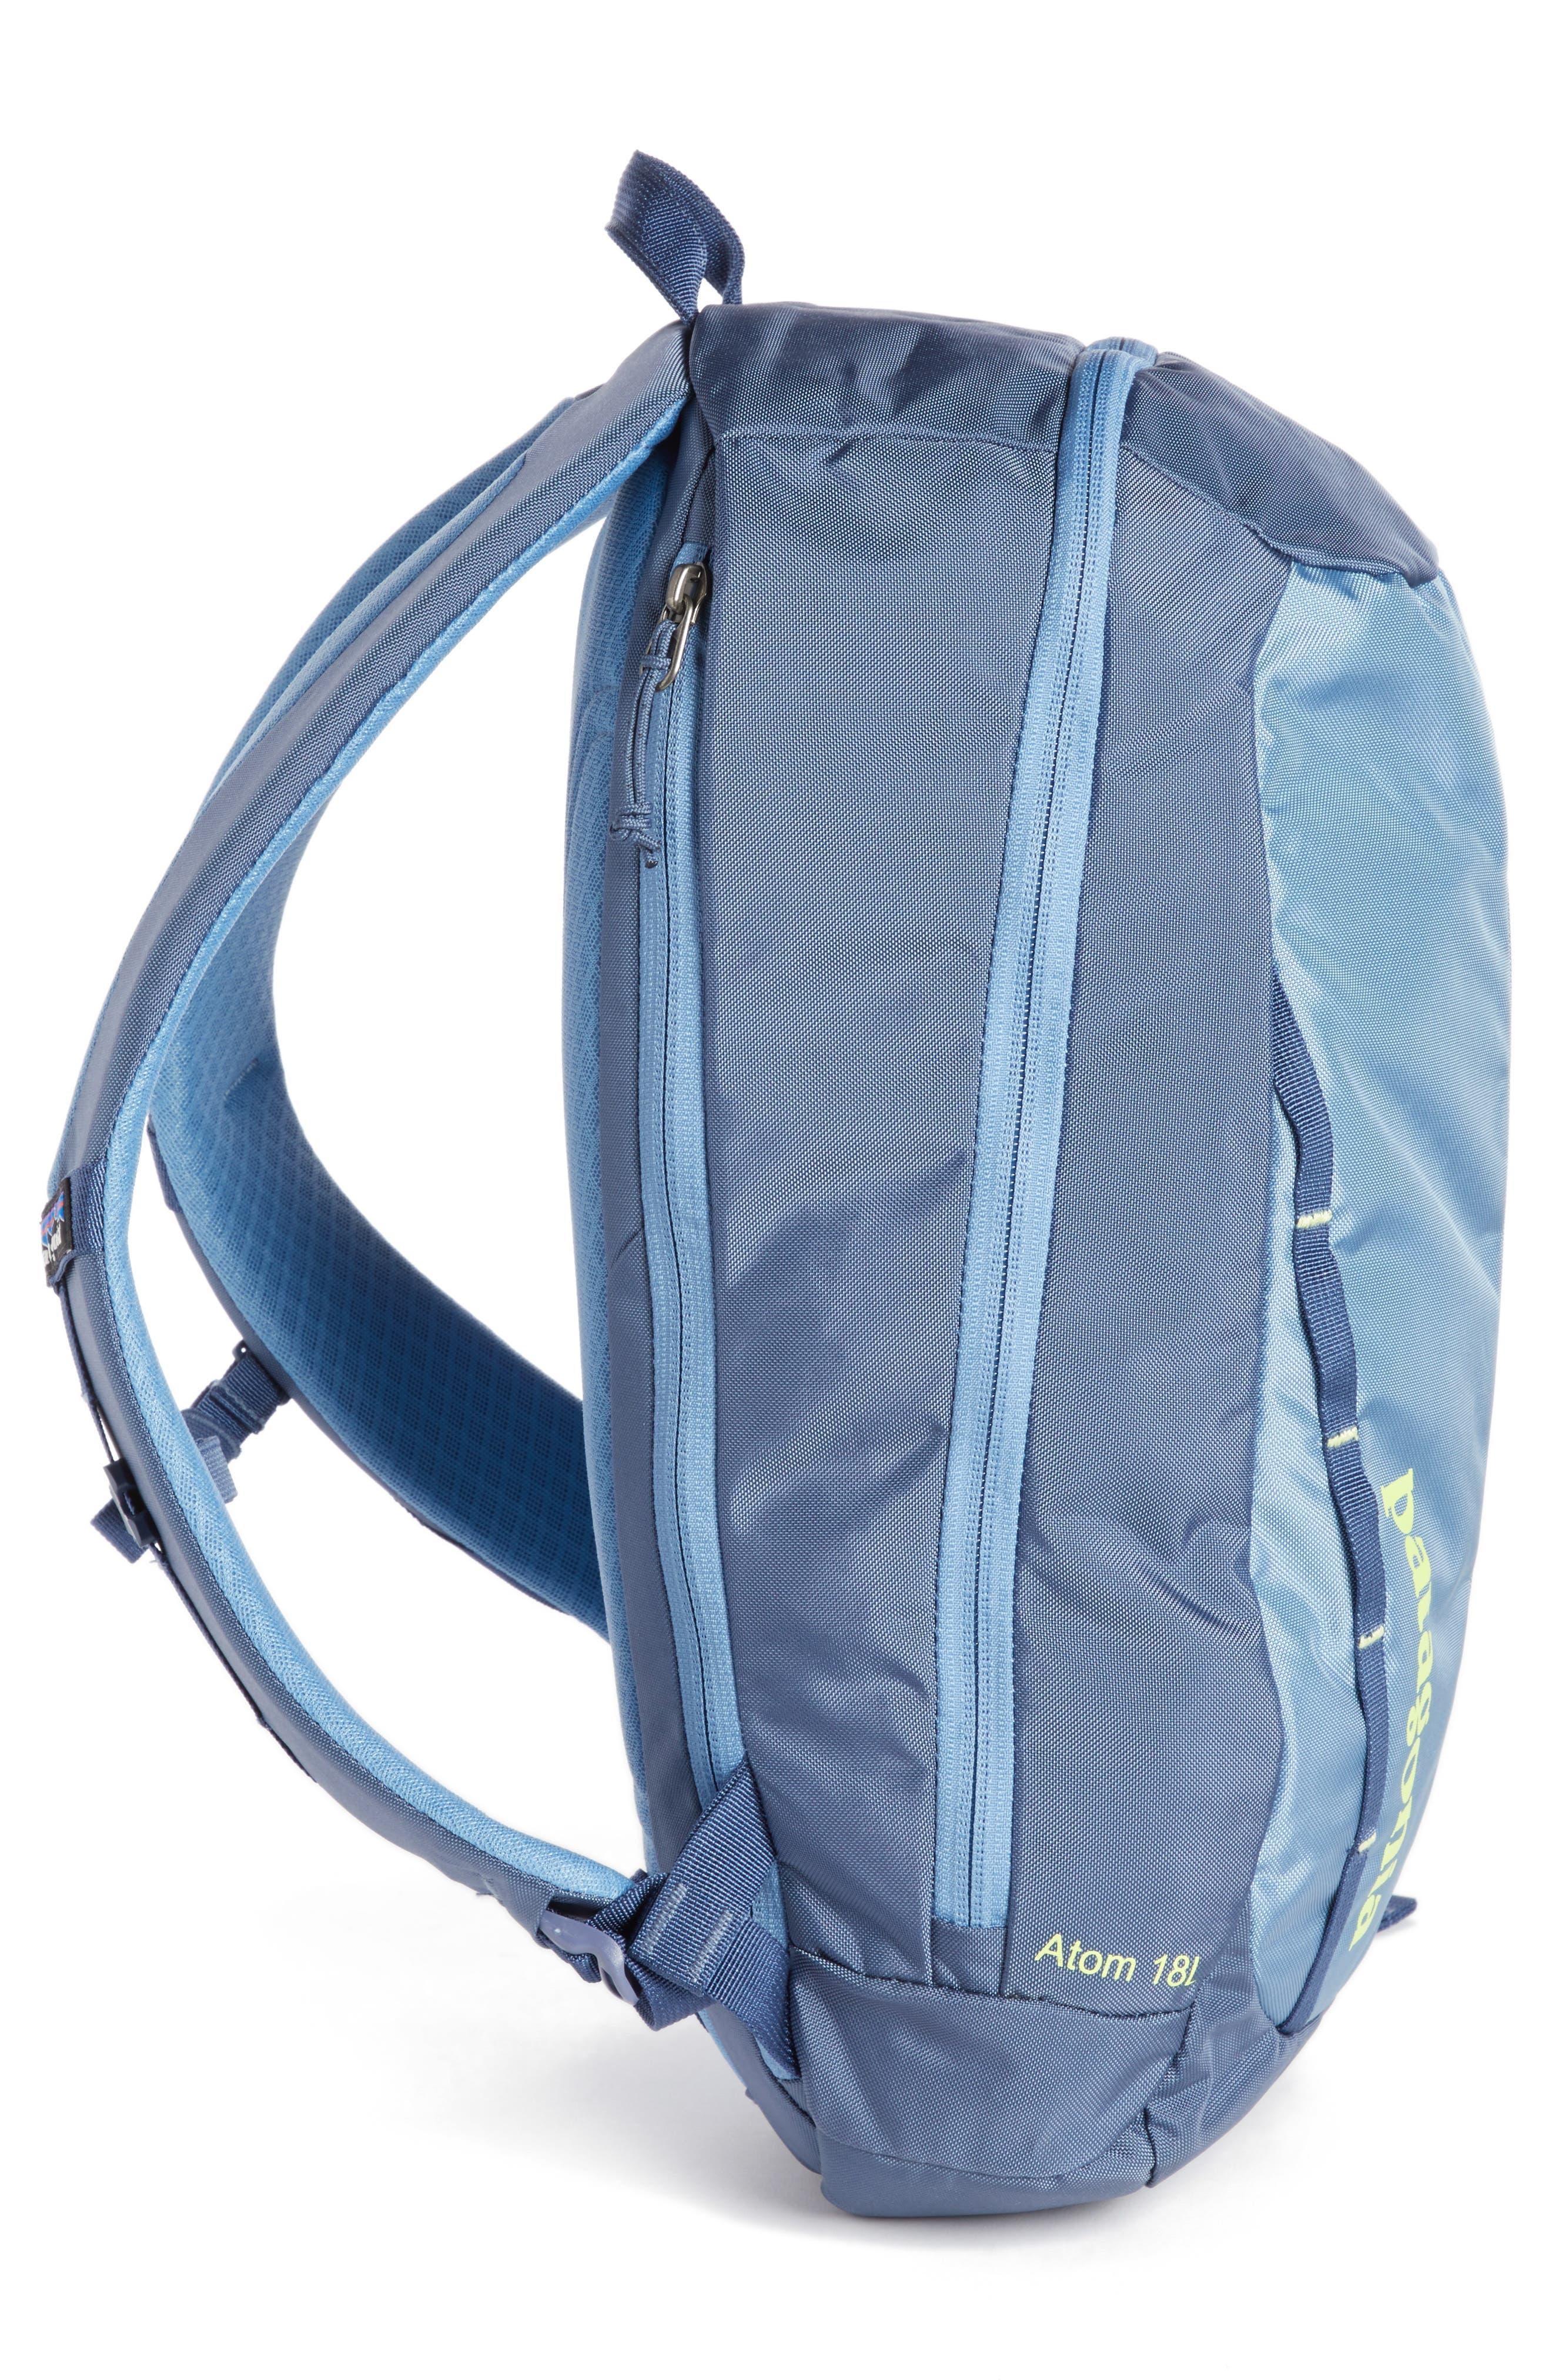 18L Atom Backpack,                             Alternate thumbnail 5, color,                             Dolomite Blue